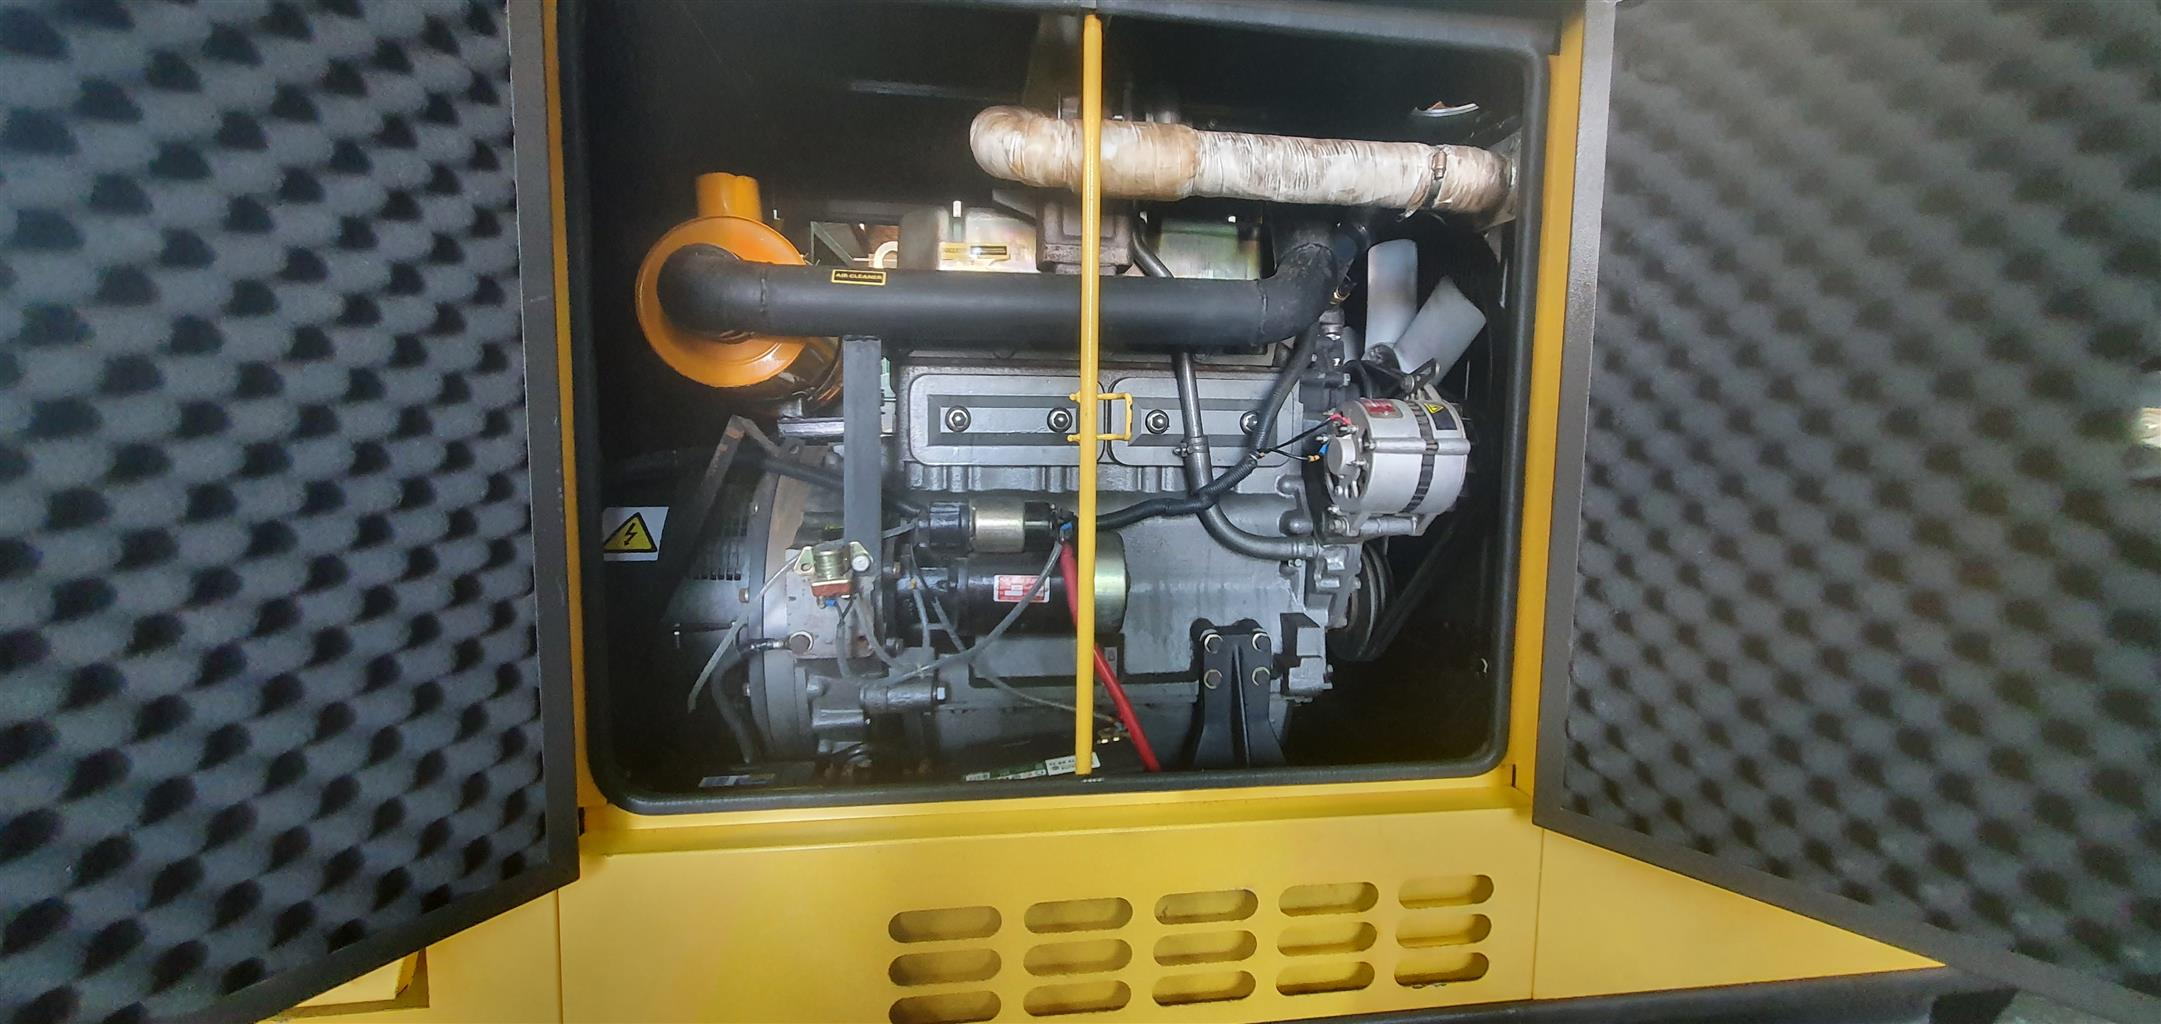 50 KVA Ricardo generator in Canopy